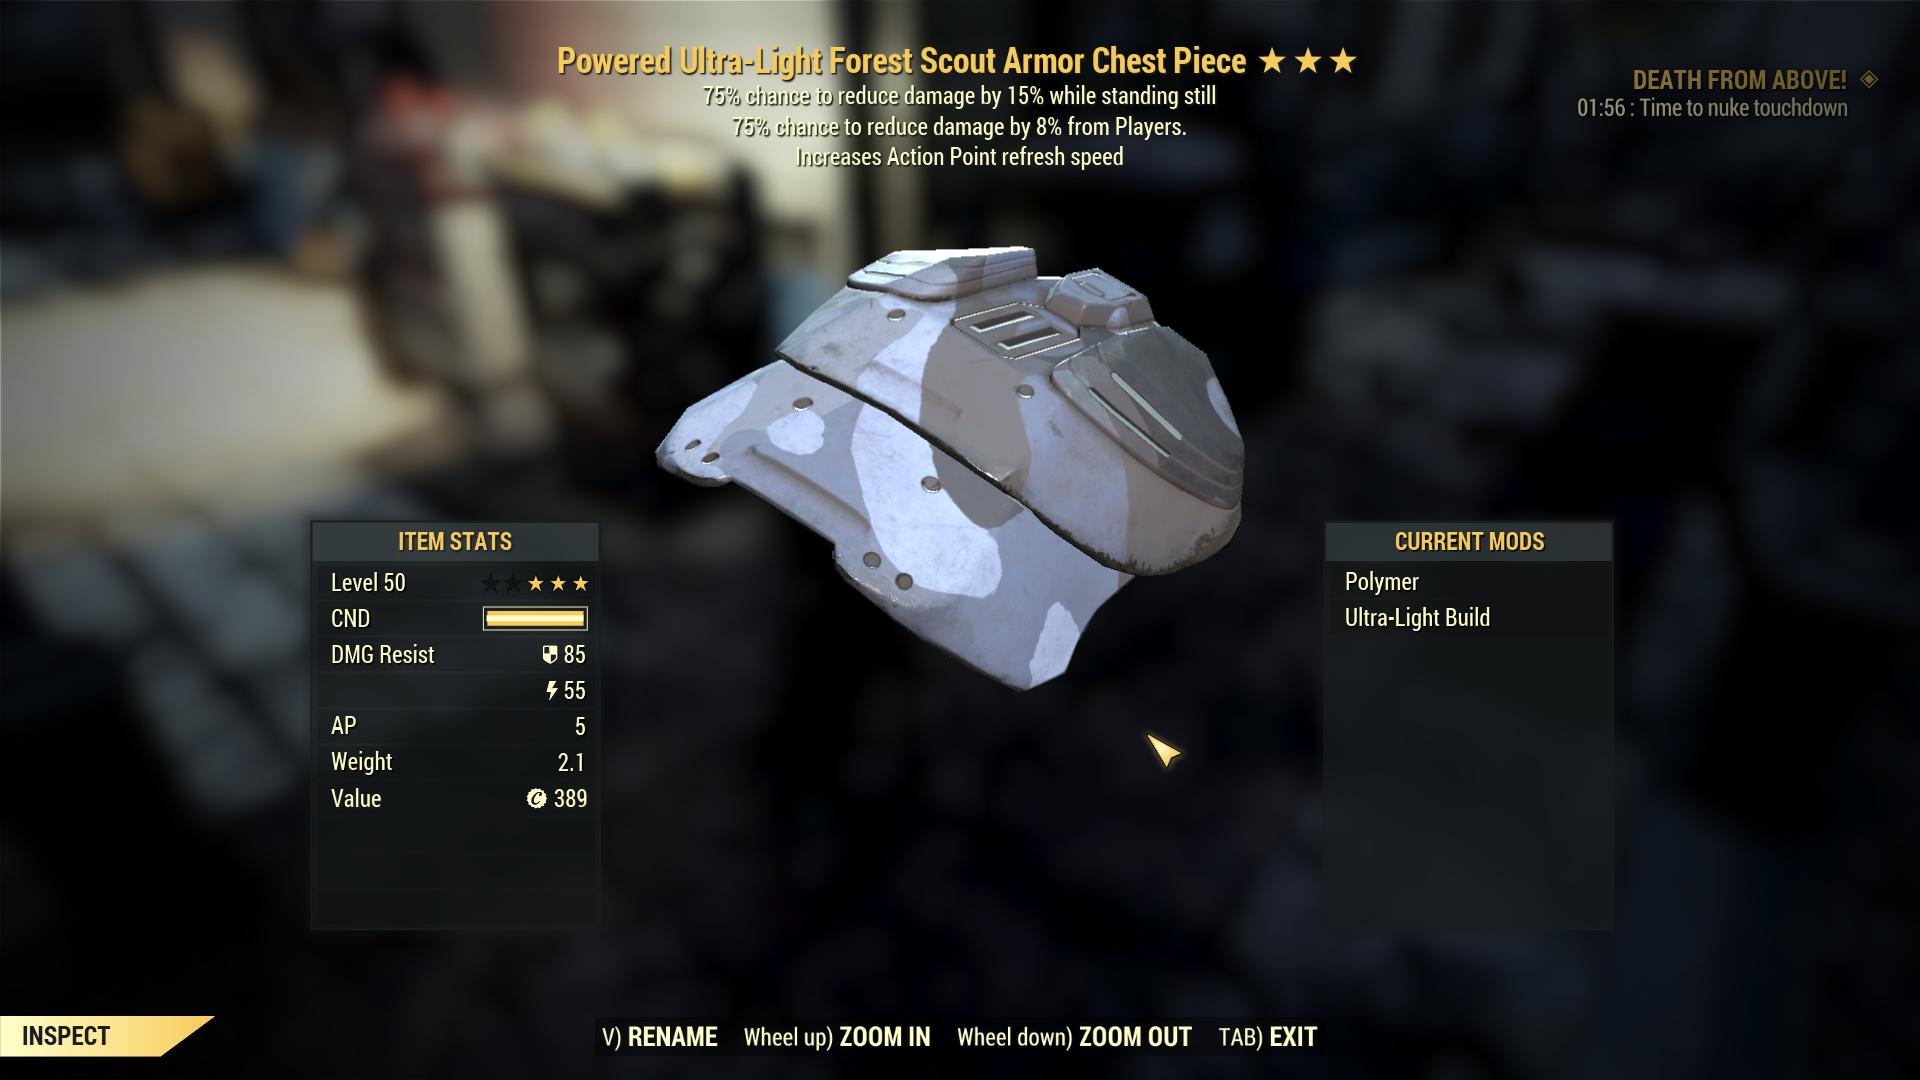 [PVP SET] Assasin's Sentinel (Powered) Urban Scout Armor Set (5/5 FULL AP REFRESH)